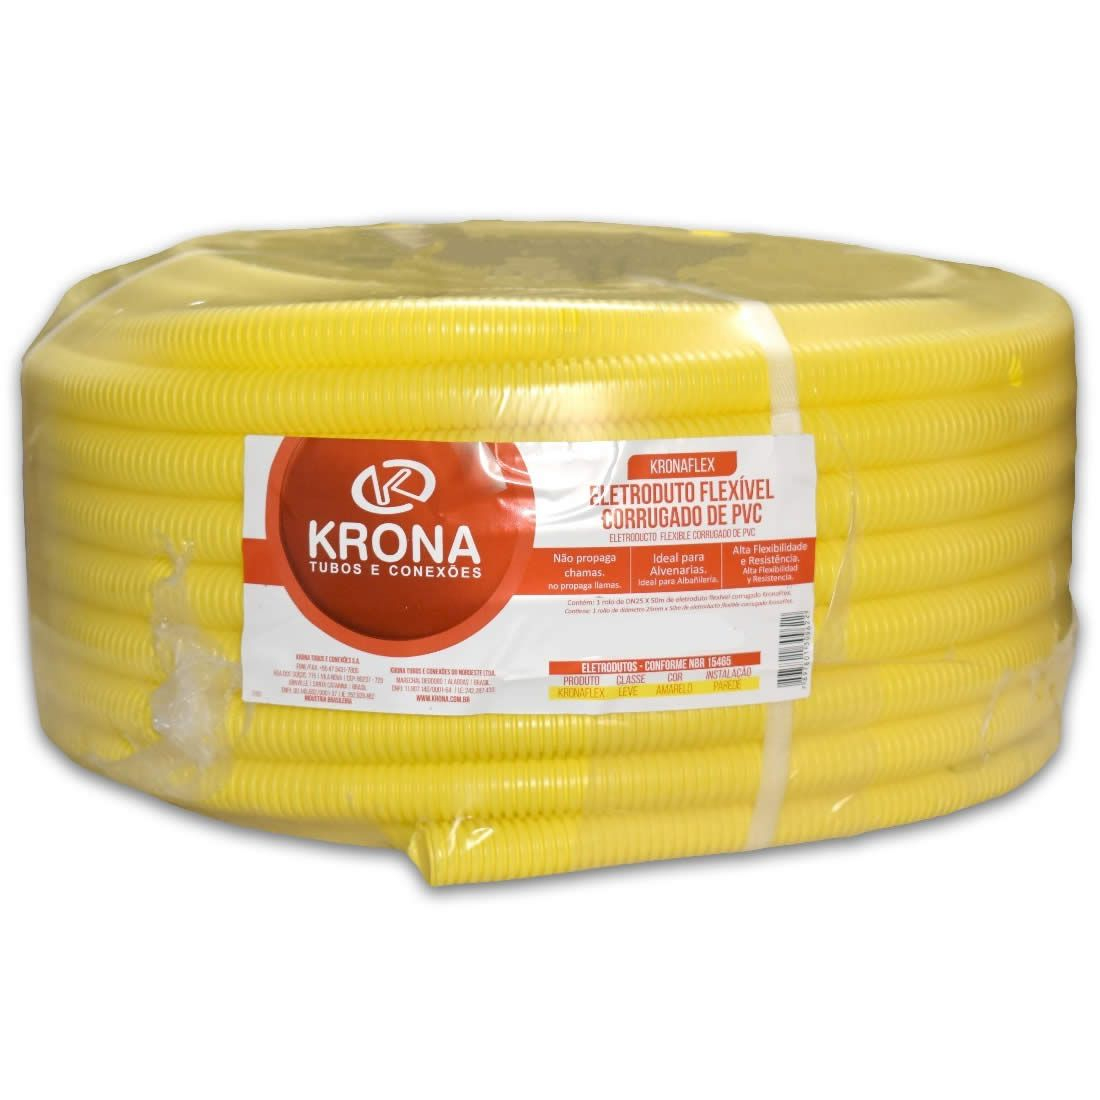 Eletro Corrugado 32mm Rolo Com 25 Metros PVC Krona